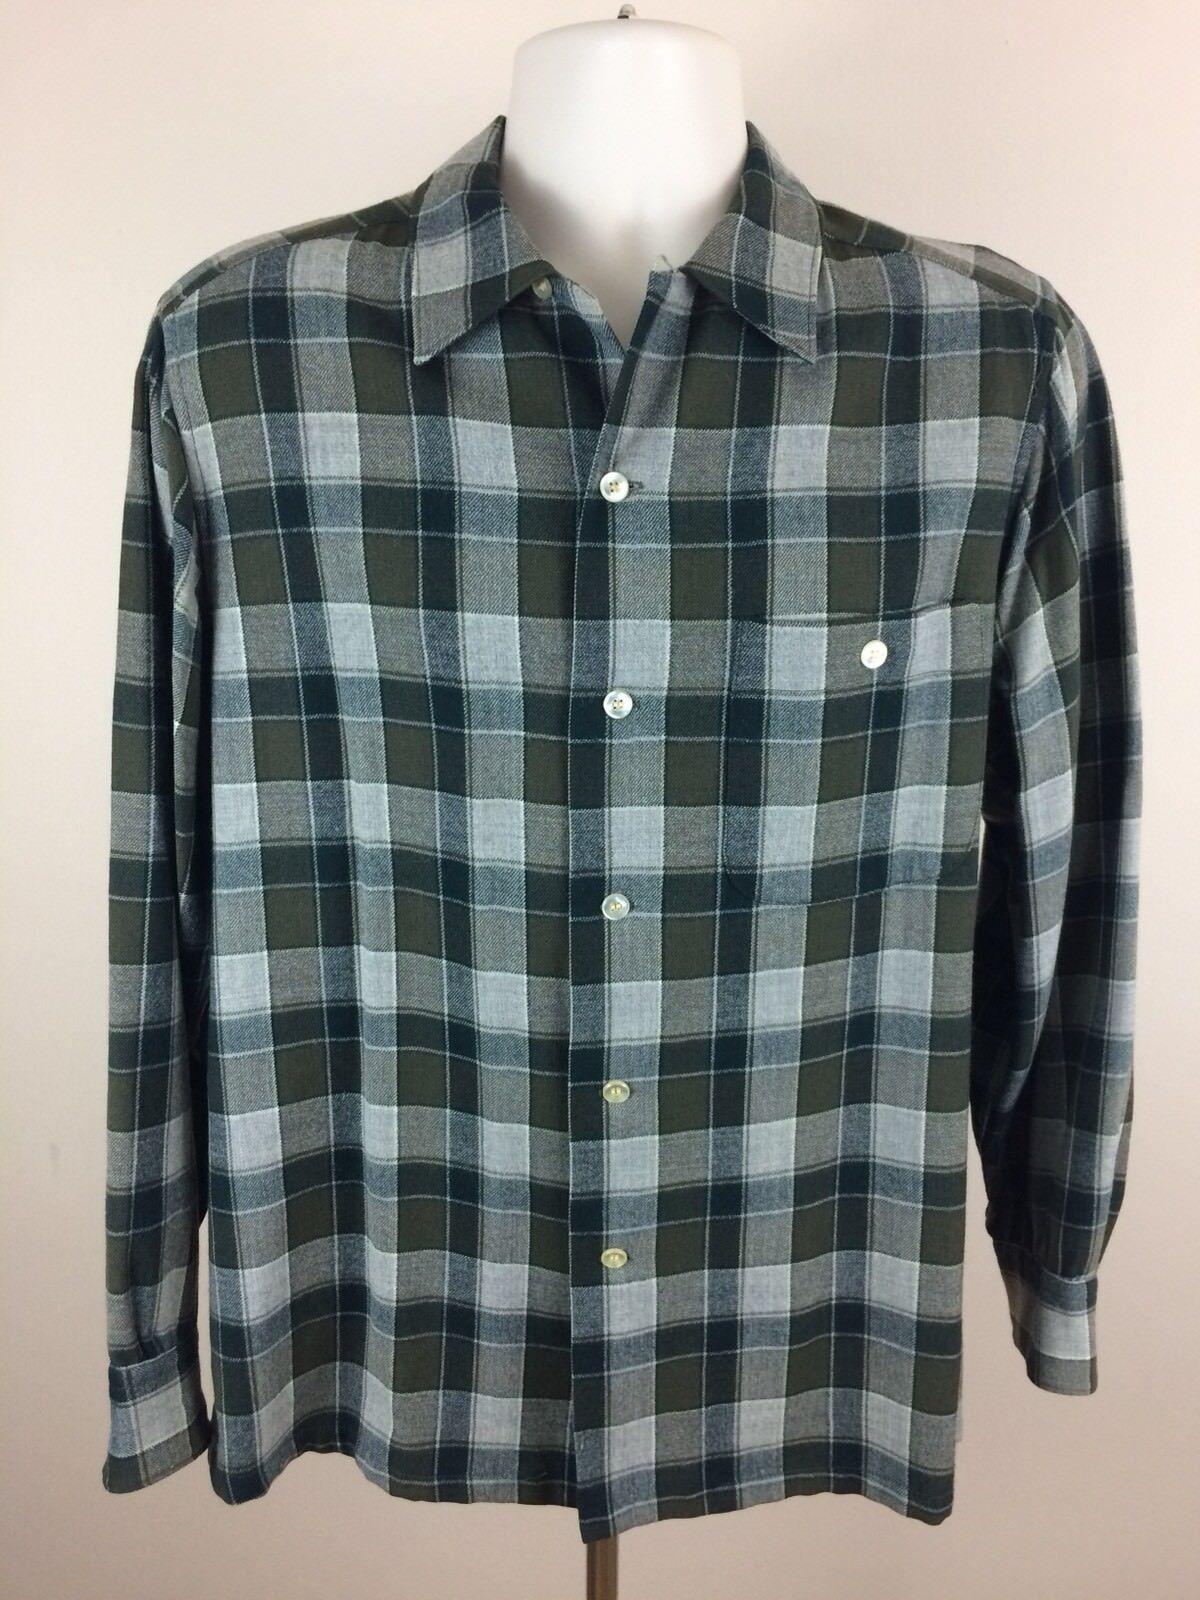 Vtg 60s Sir Pendleton Loop Collar 100% Virgin Wool Button Up Casual Shirt Medium